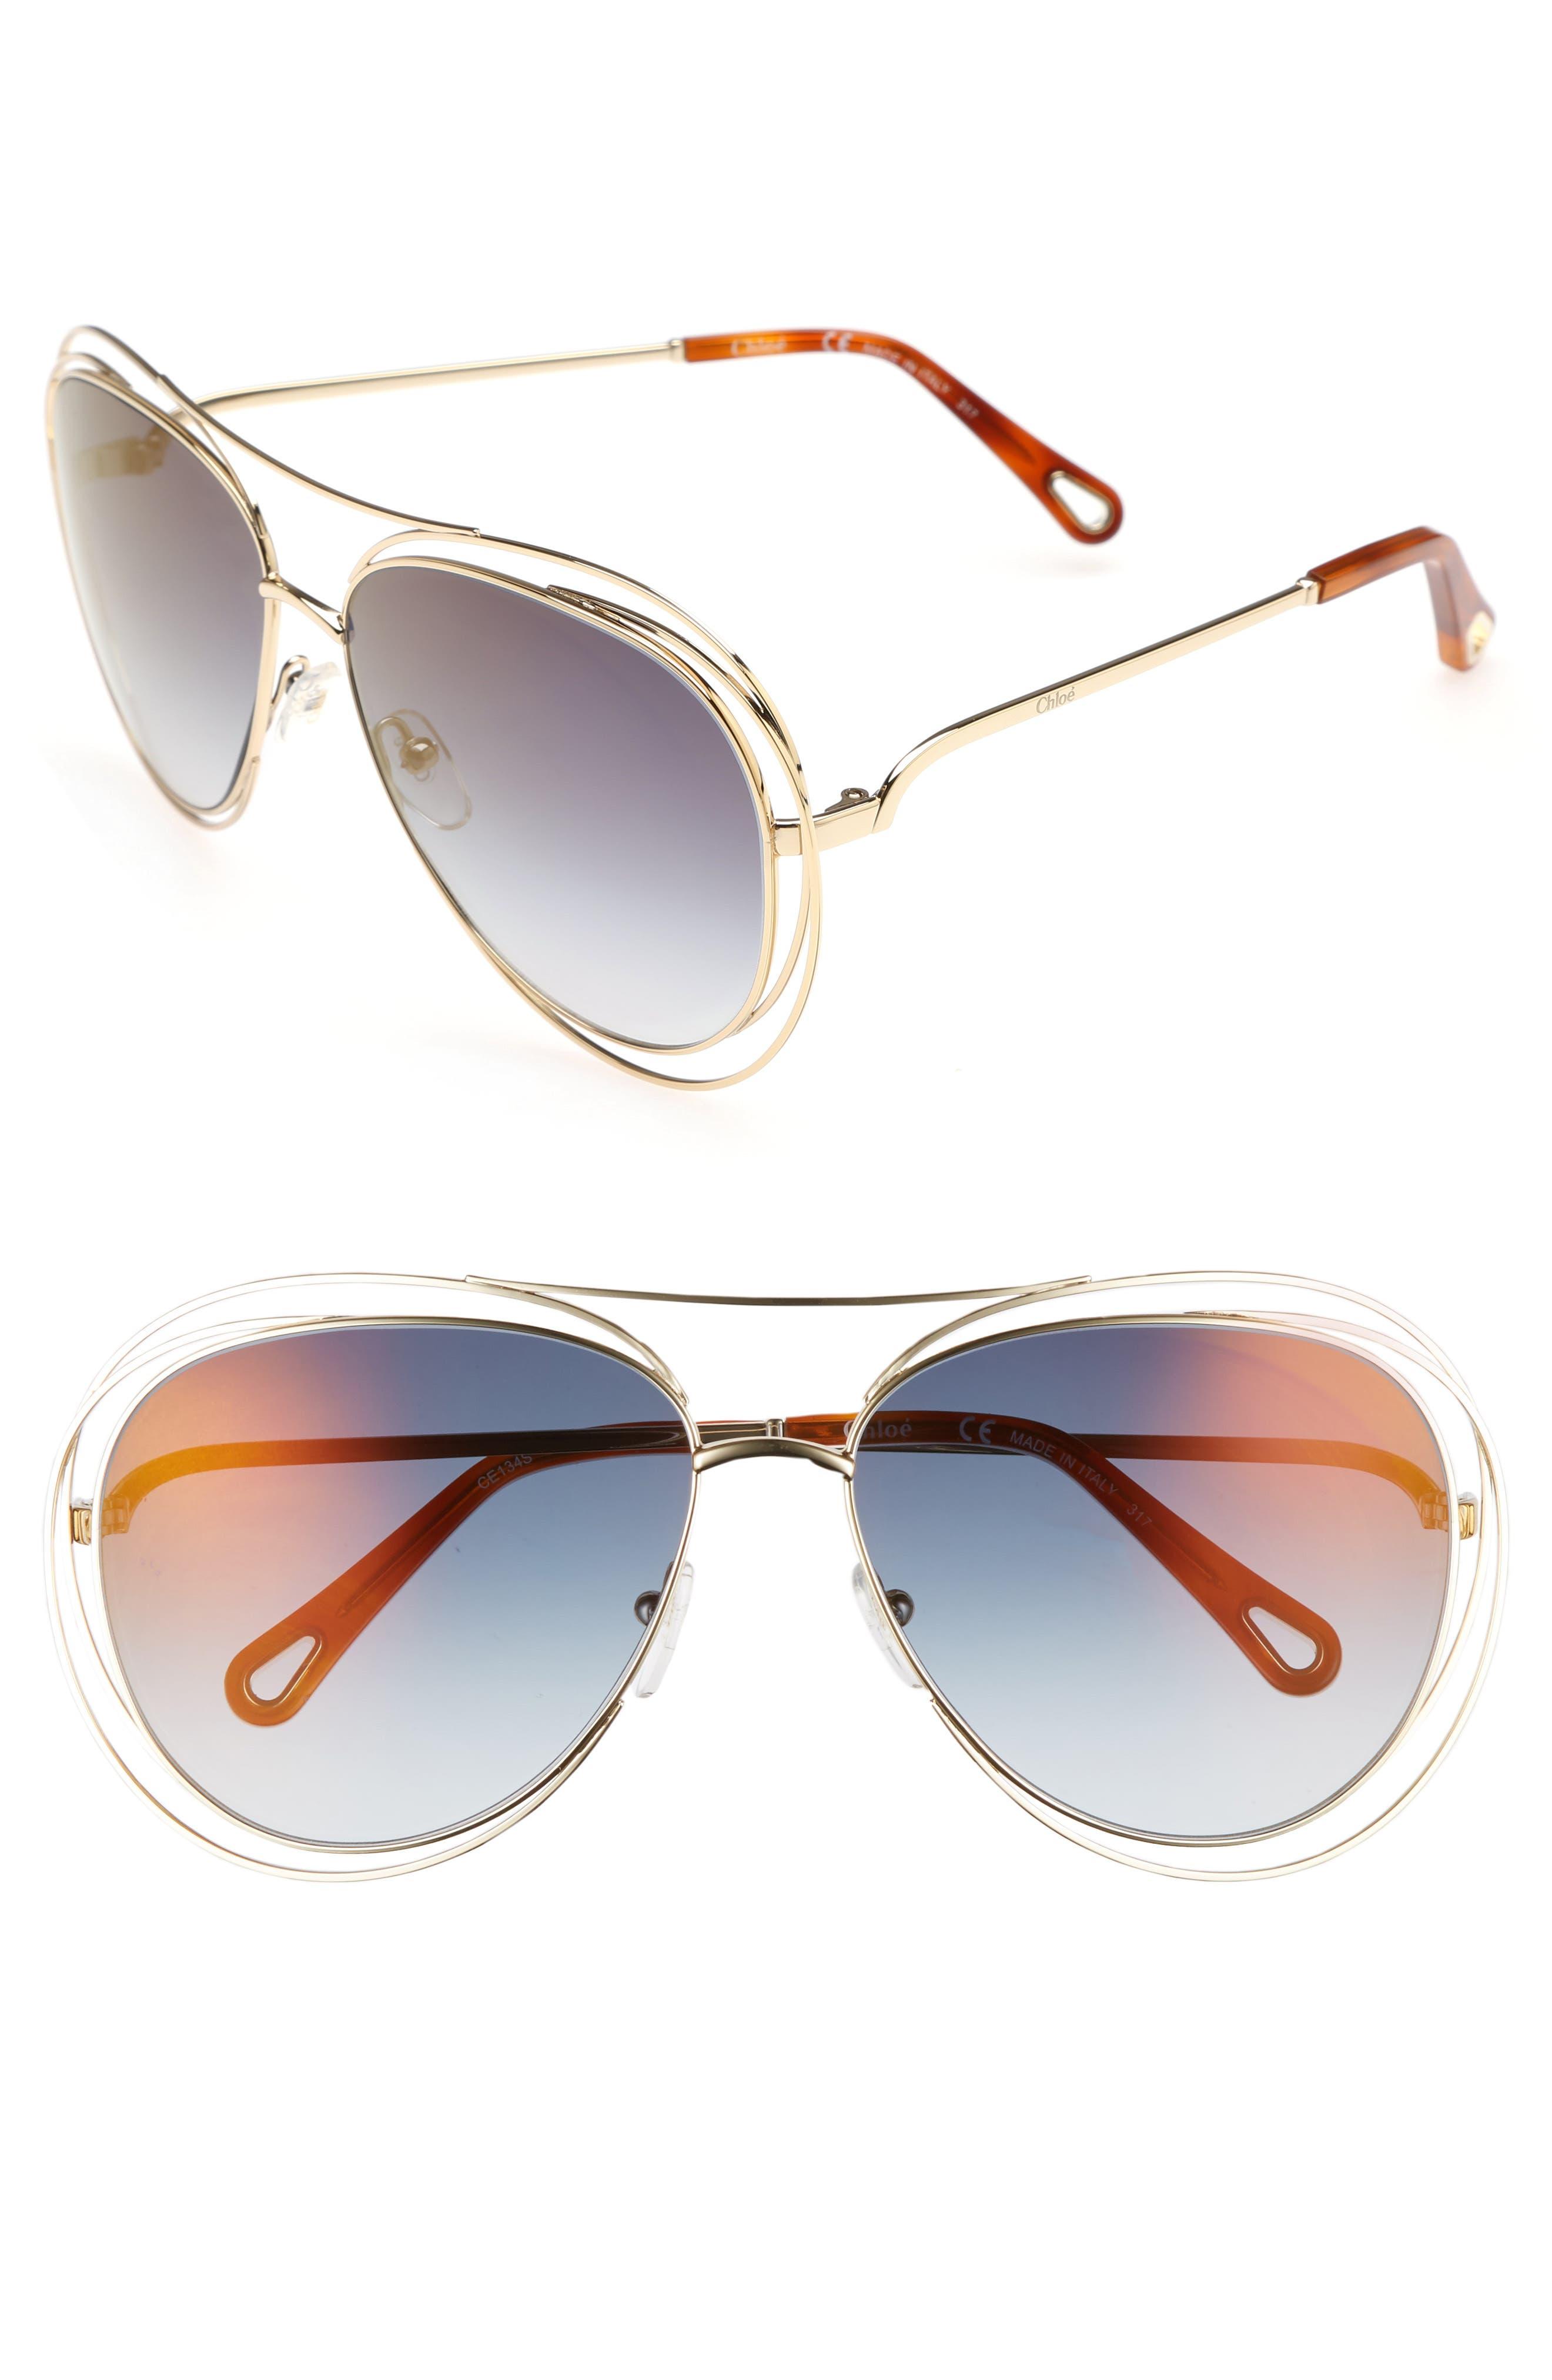 CHLOÉ 61mm Aviator Sunglasses, Main, color, GOLD/ HAVANA/ FLASH BLUE